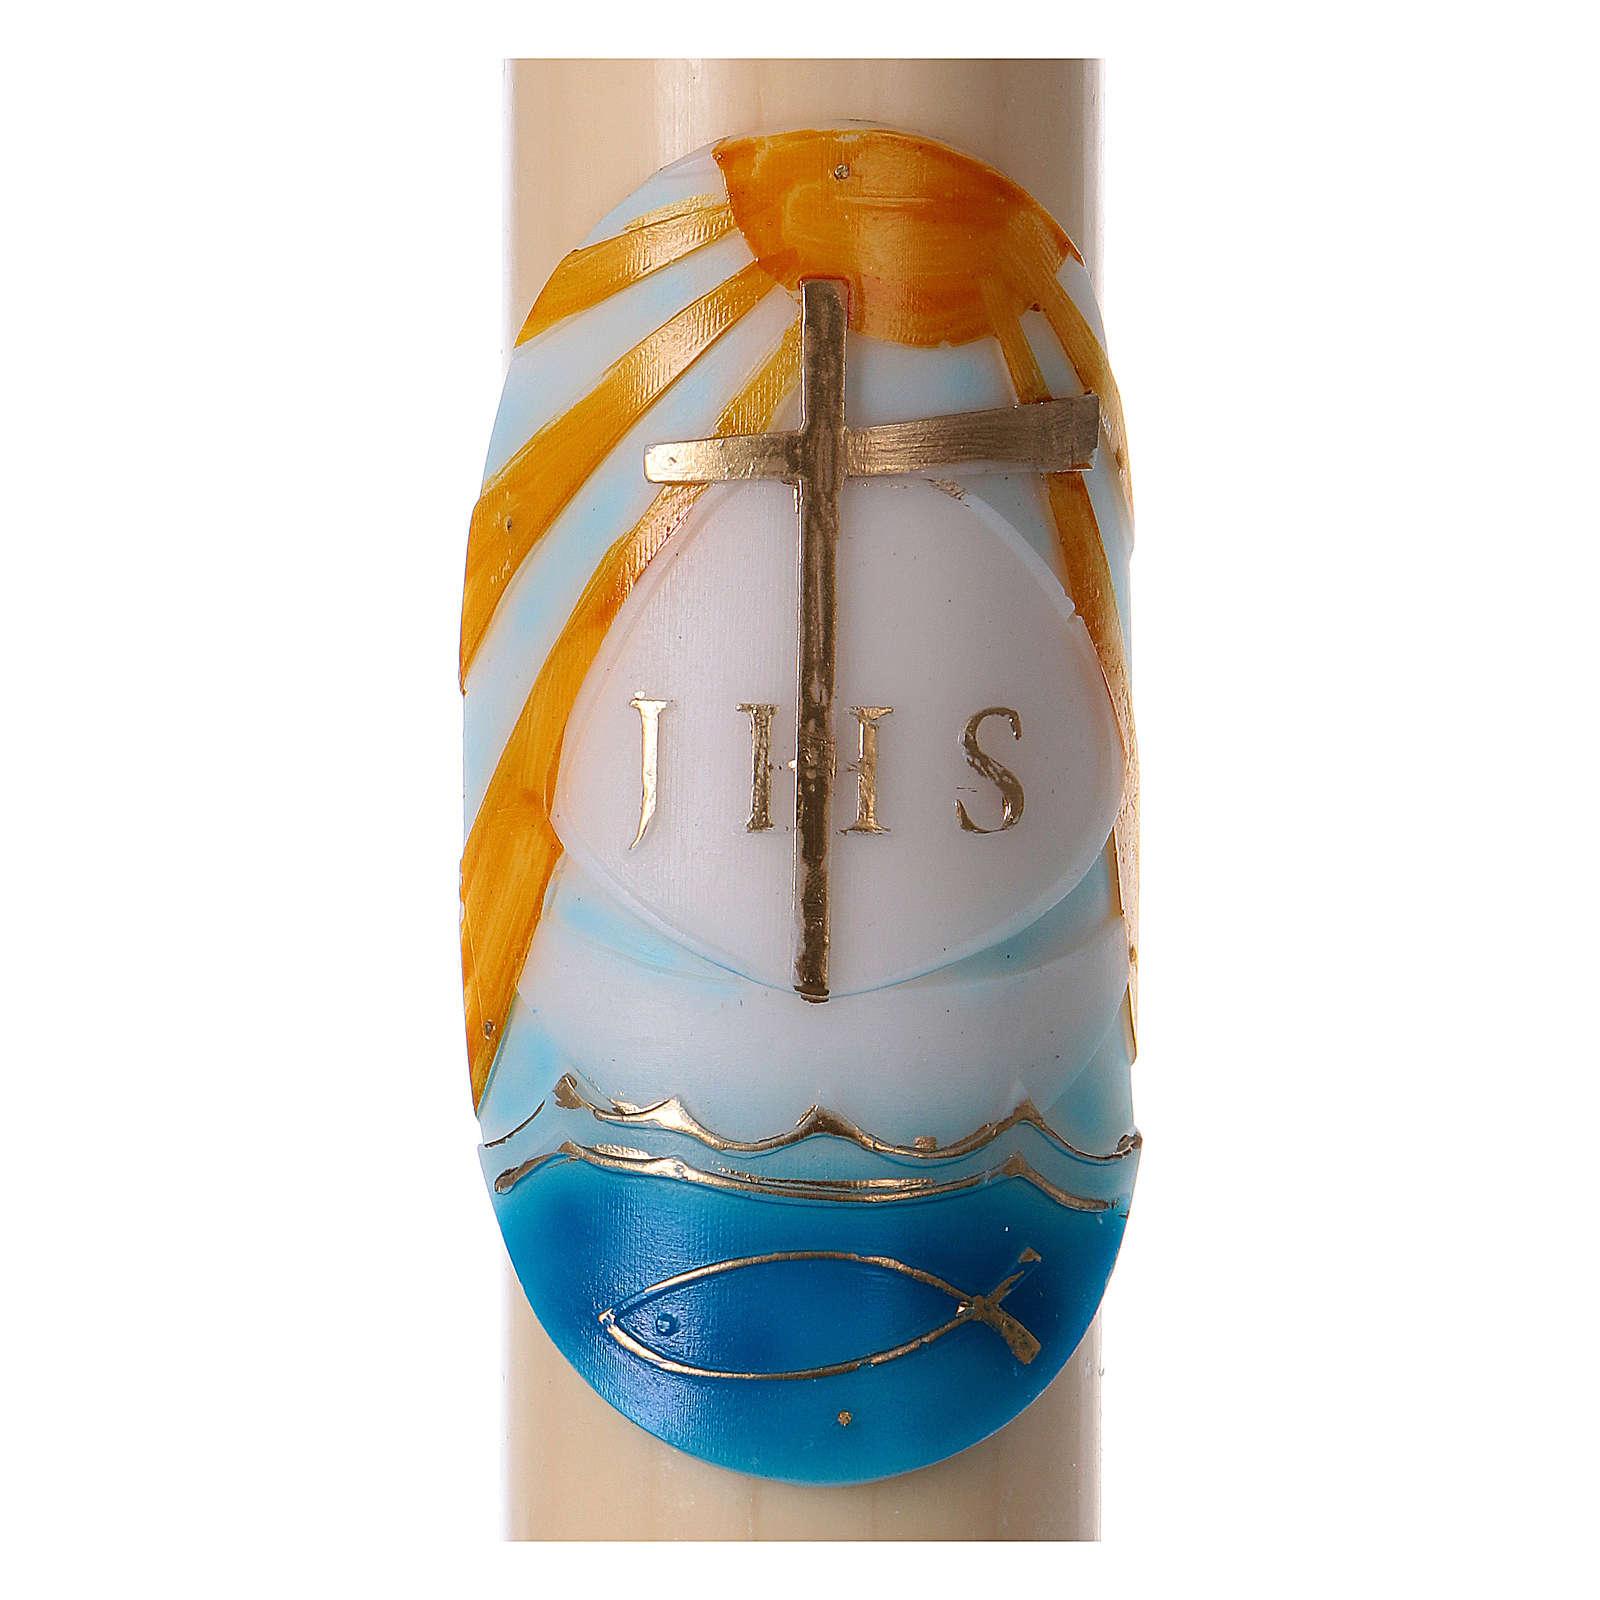 Cero pasquale cera d'api Barca colorata 8x120 cm 3